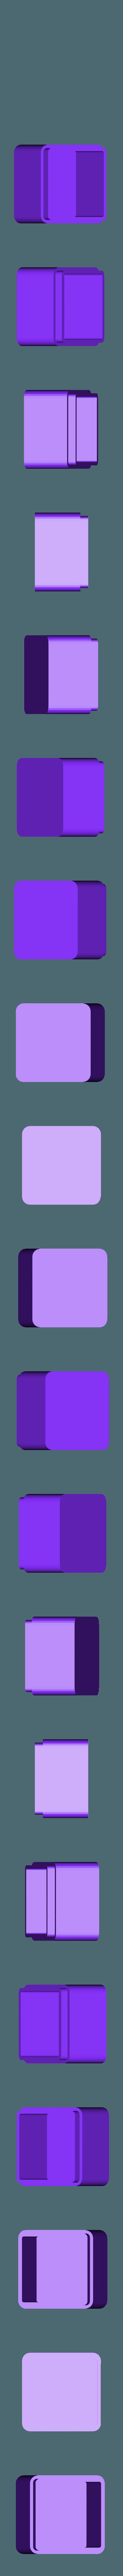 Boite-20x20x15-Dessous.stl Download STL file Storage box for model making 20 x 20 x 20 x 15 mm • Object to 3D print, Almisuifre